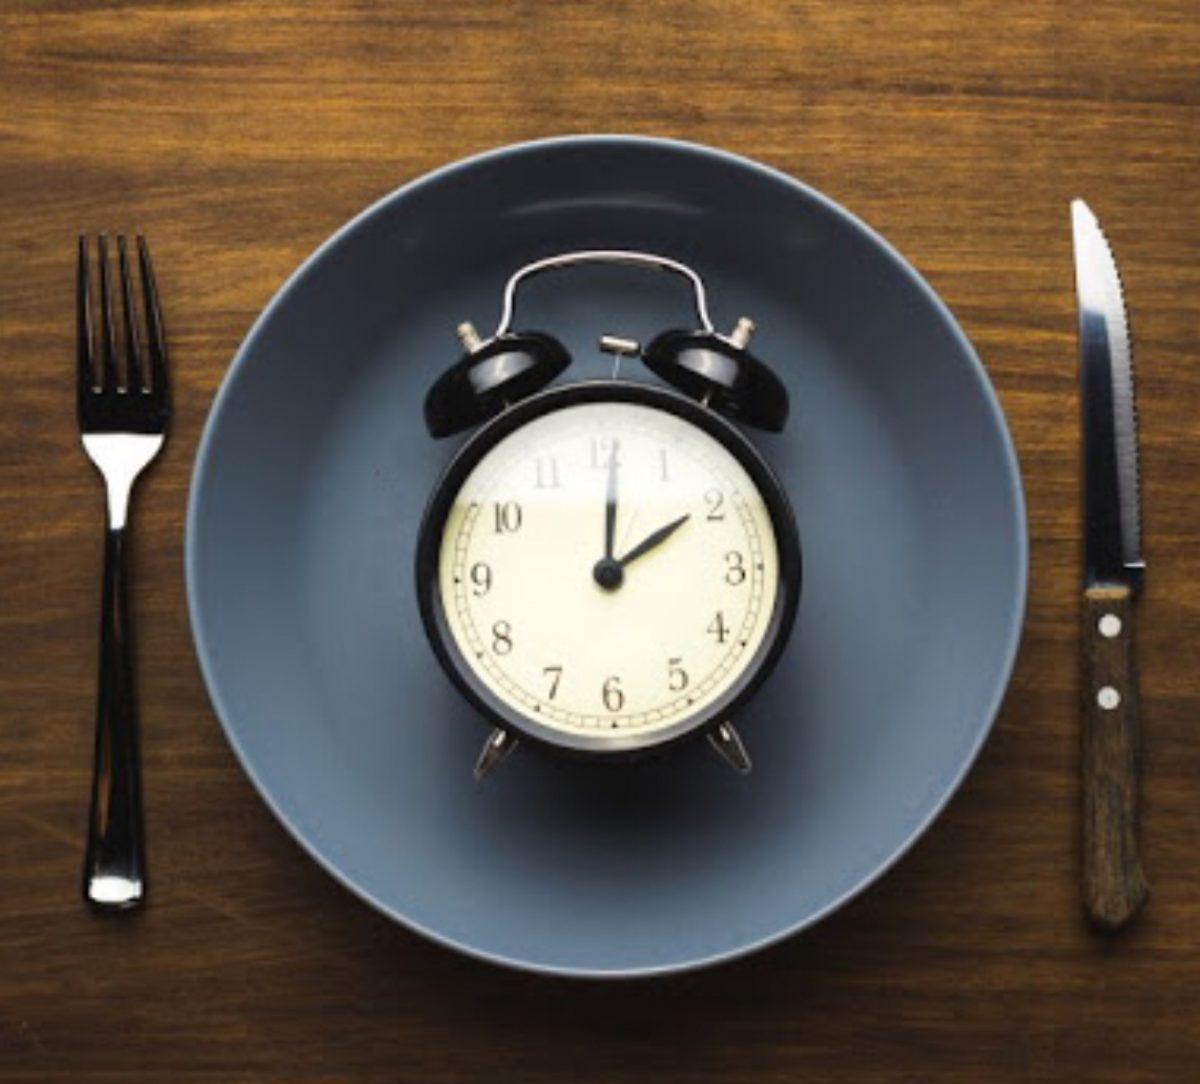 Keto? Cyclic keto? Intermittent fasting? Off label metformin?